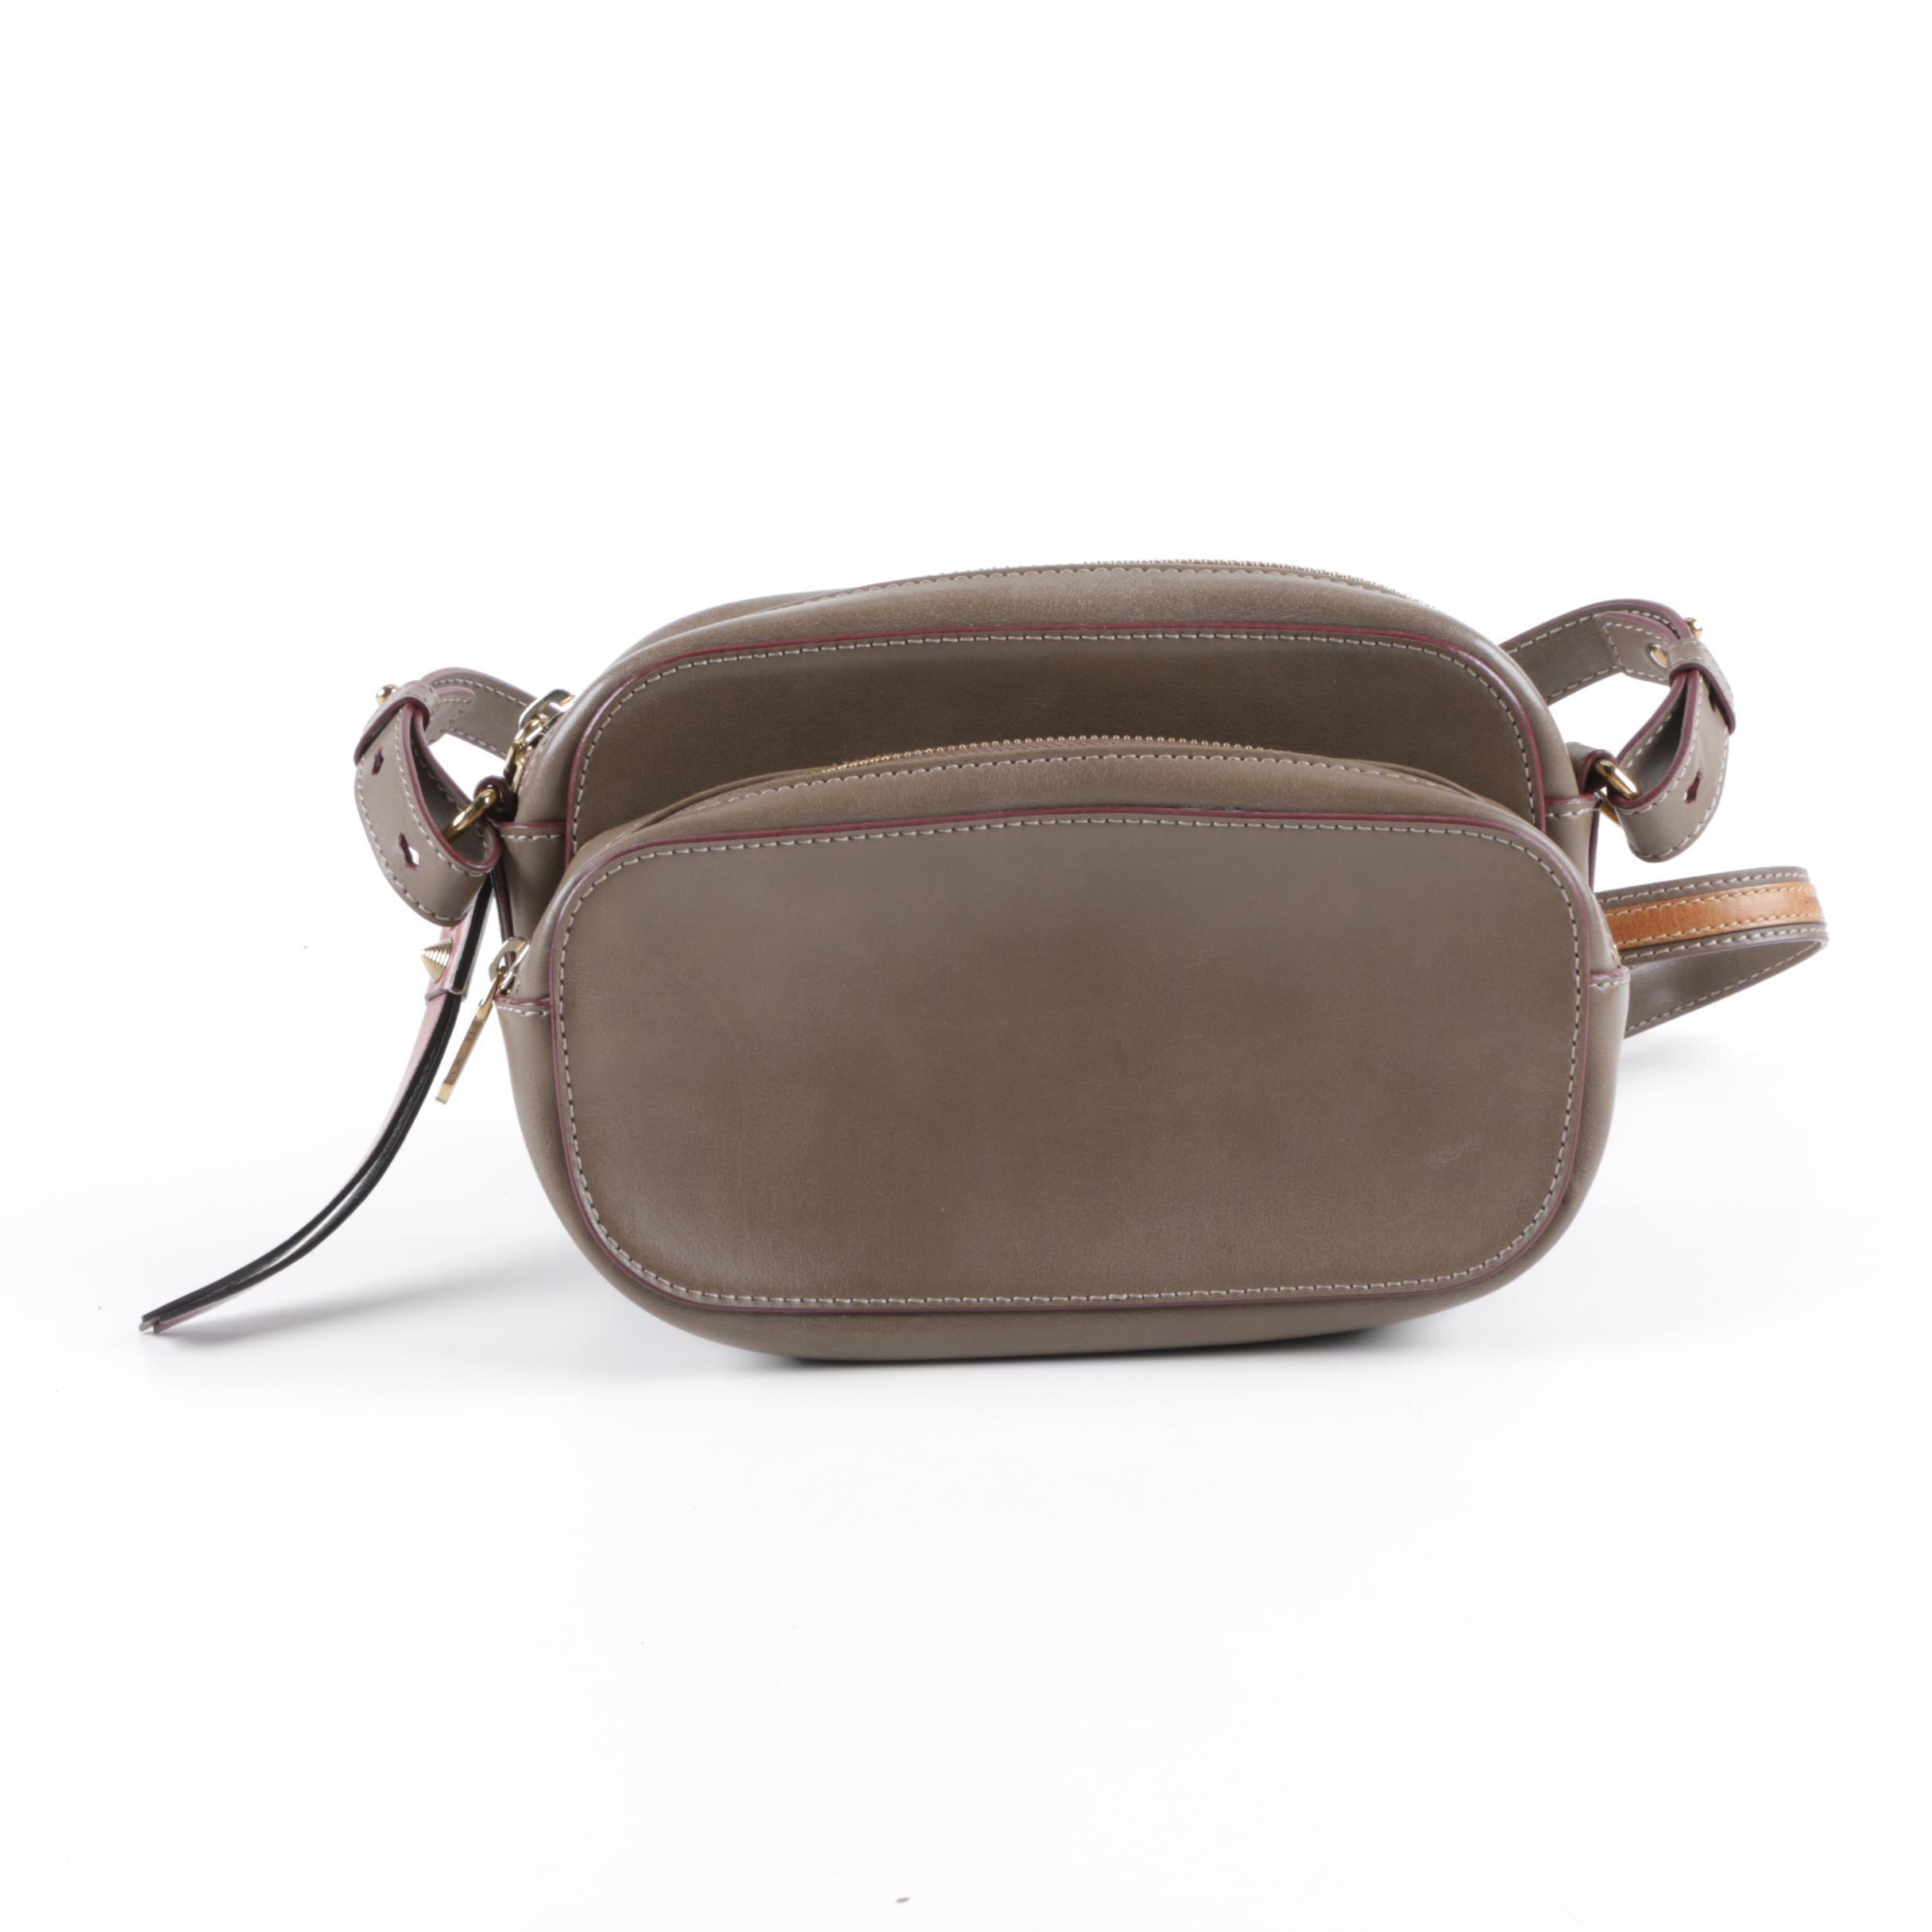 Chloé Taupe Leather Saddle Bag